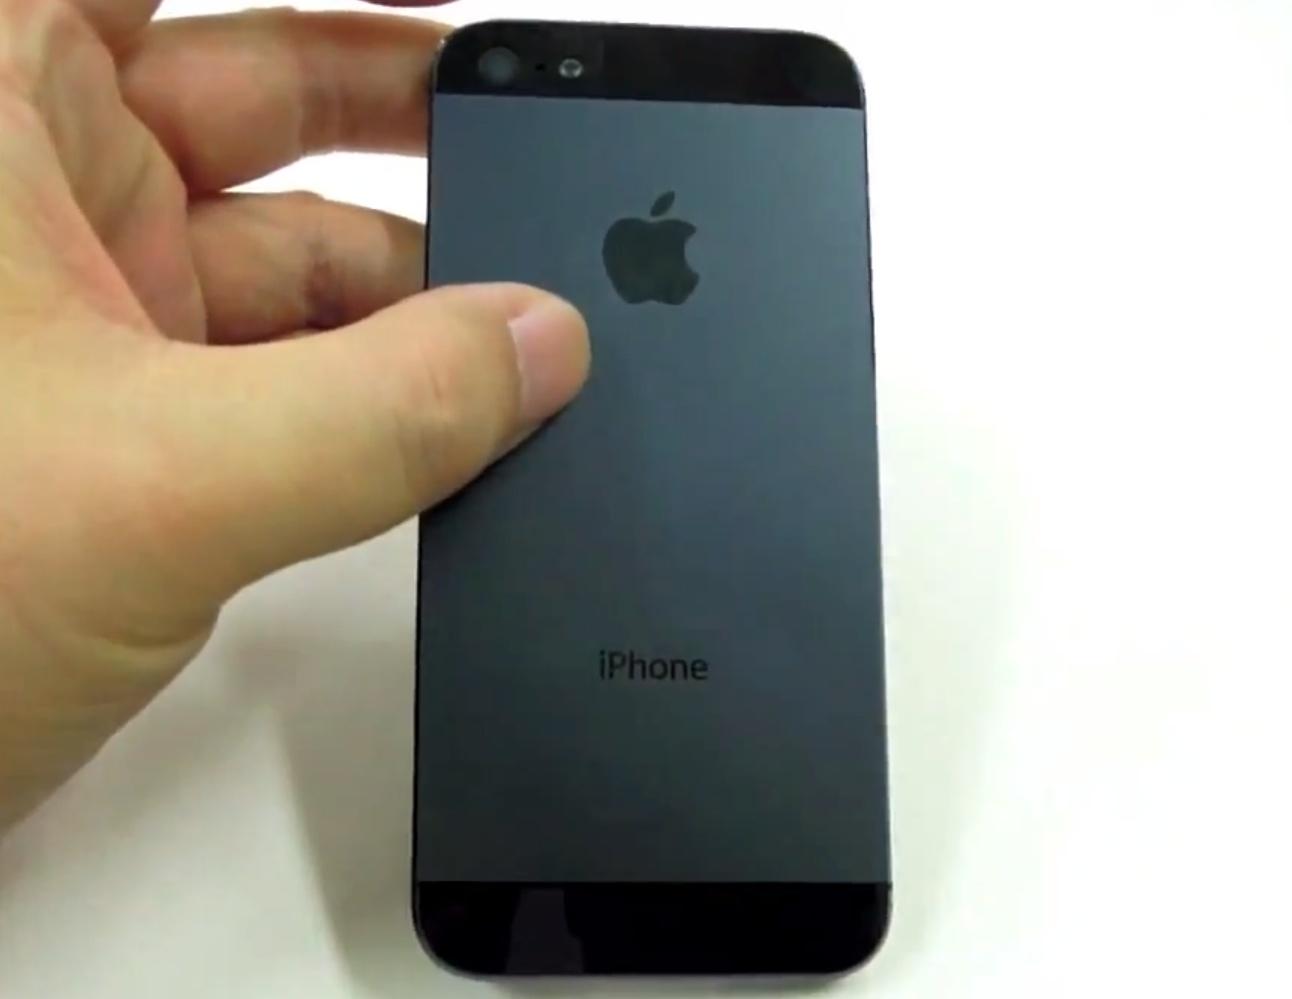 iPhone 5 video